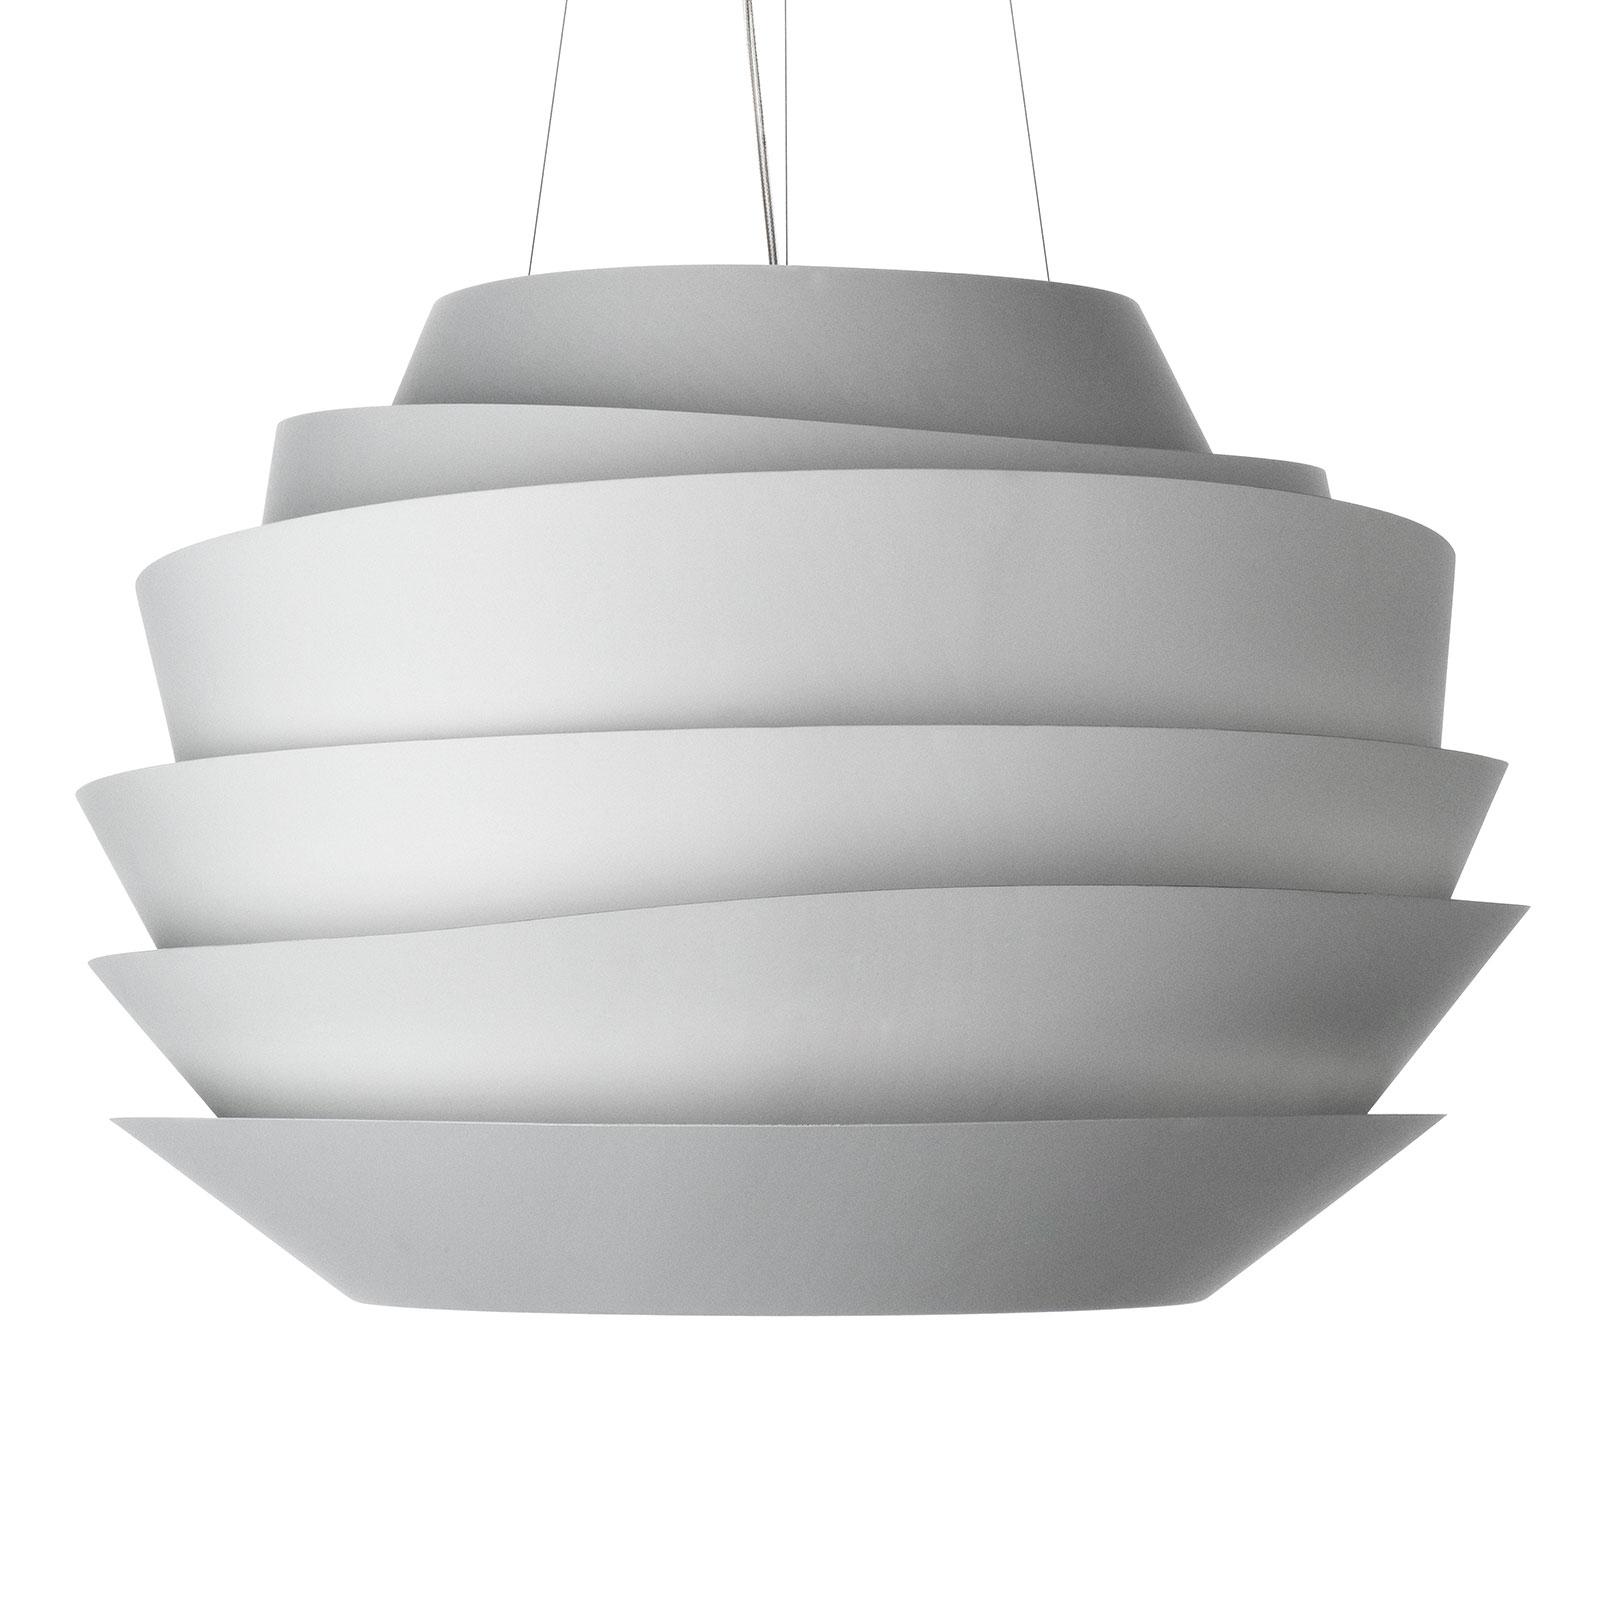 Foscarini Le Soleil LED-pendellampe hvid, dæmpbar